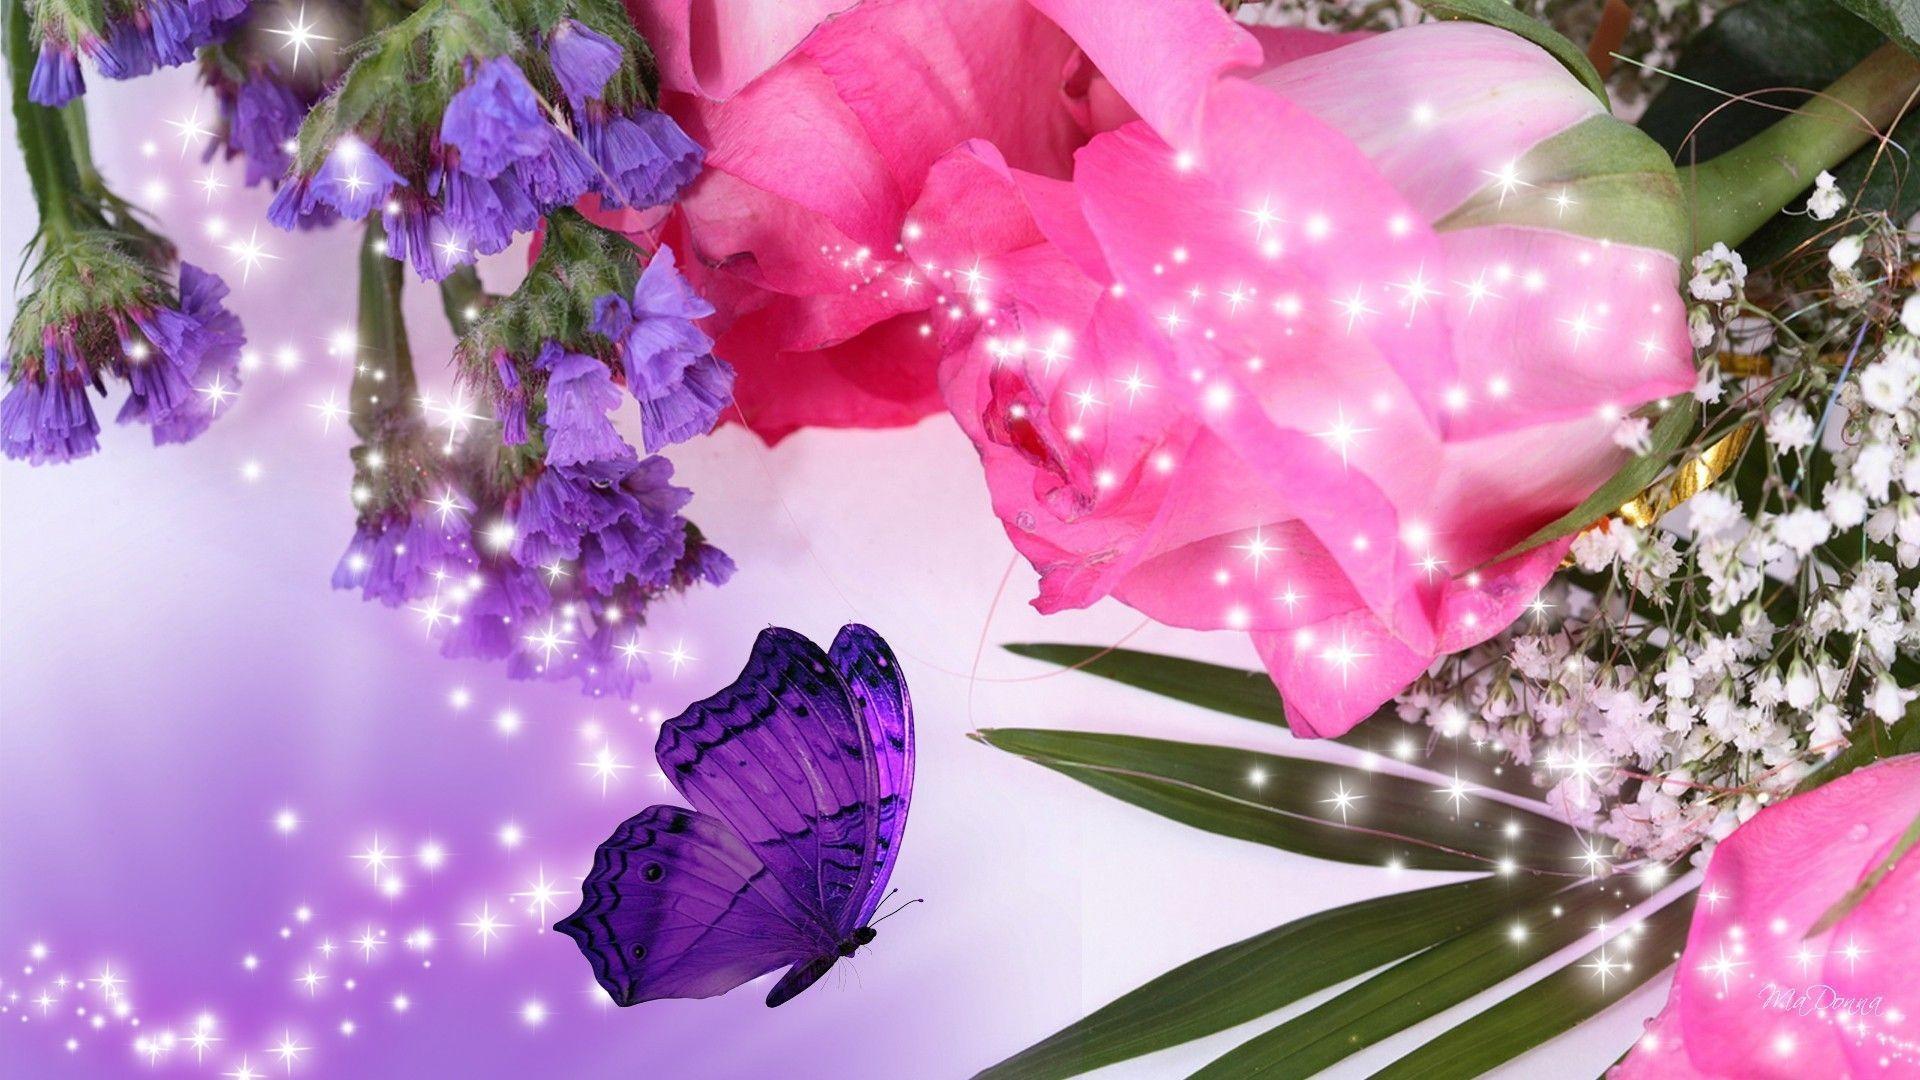 Purple Flowers Desktop Wallpaper, Purple Flower Images, New Wallpapers